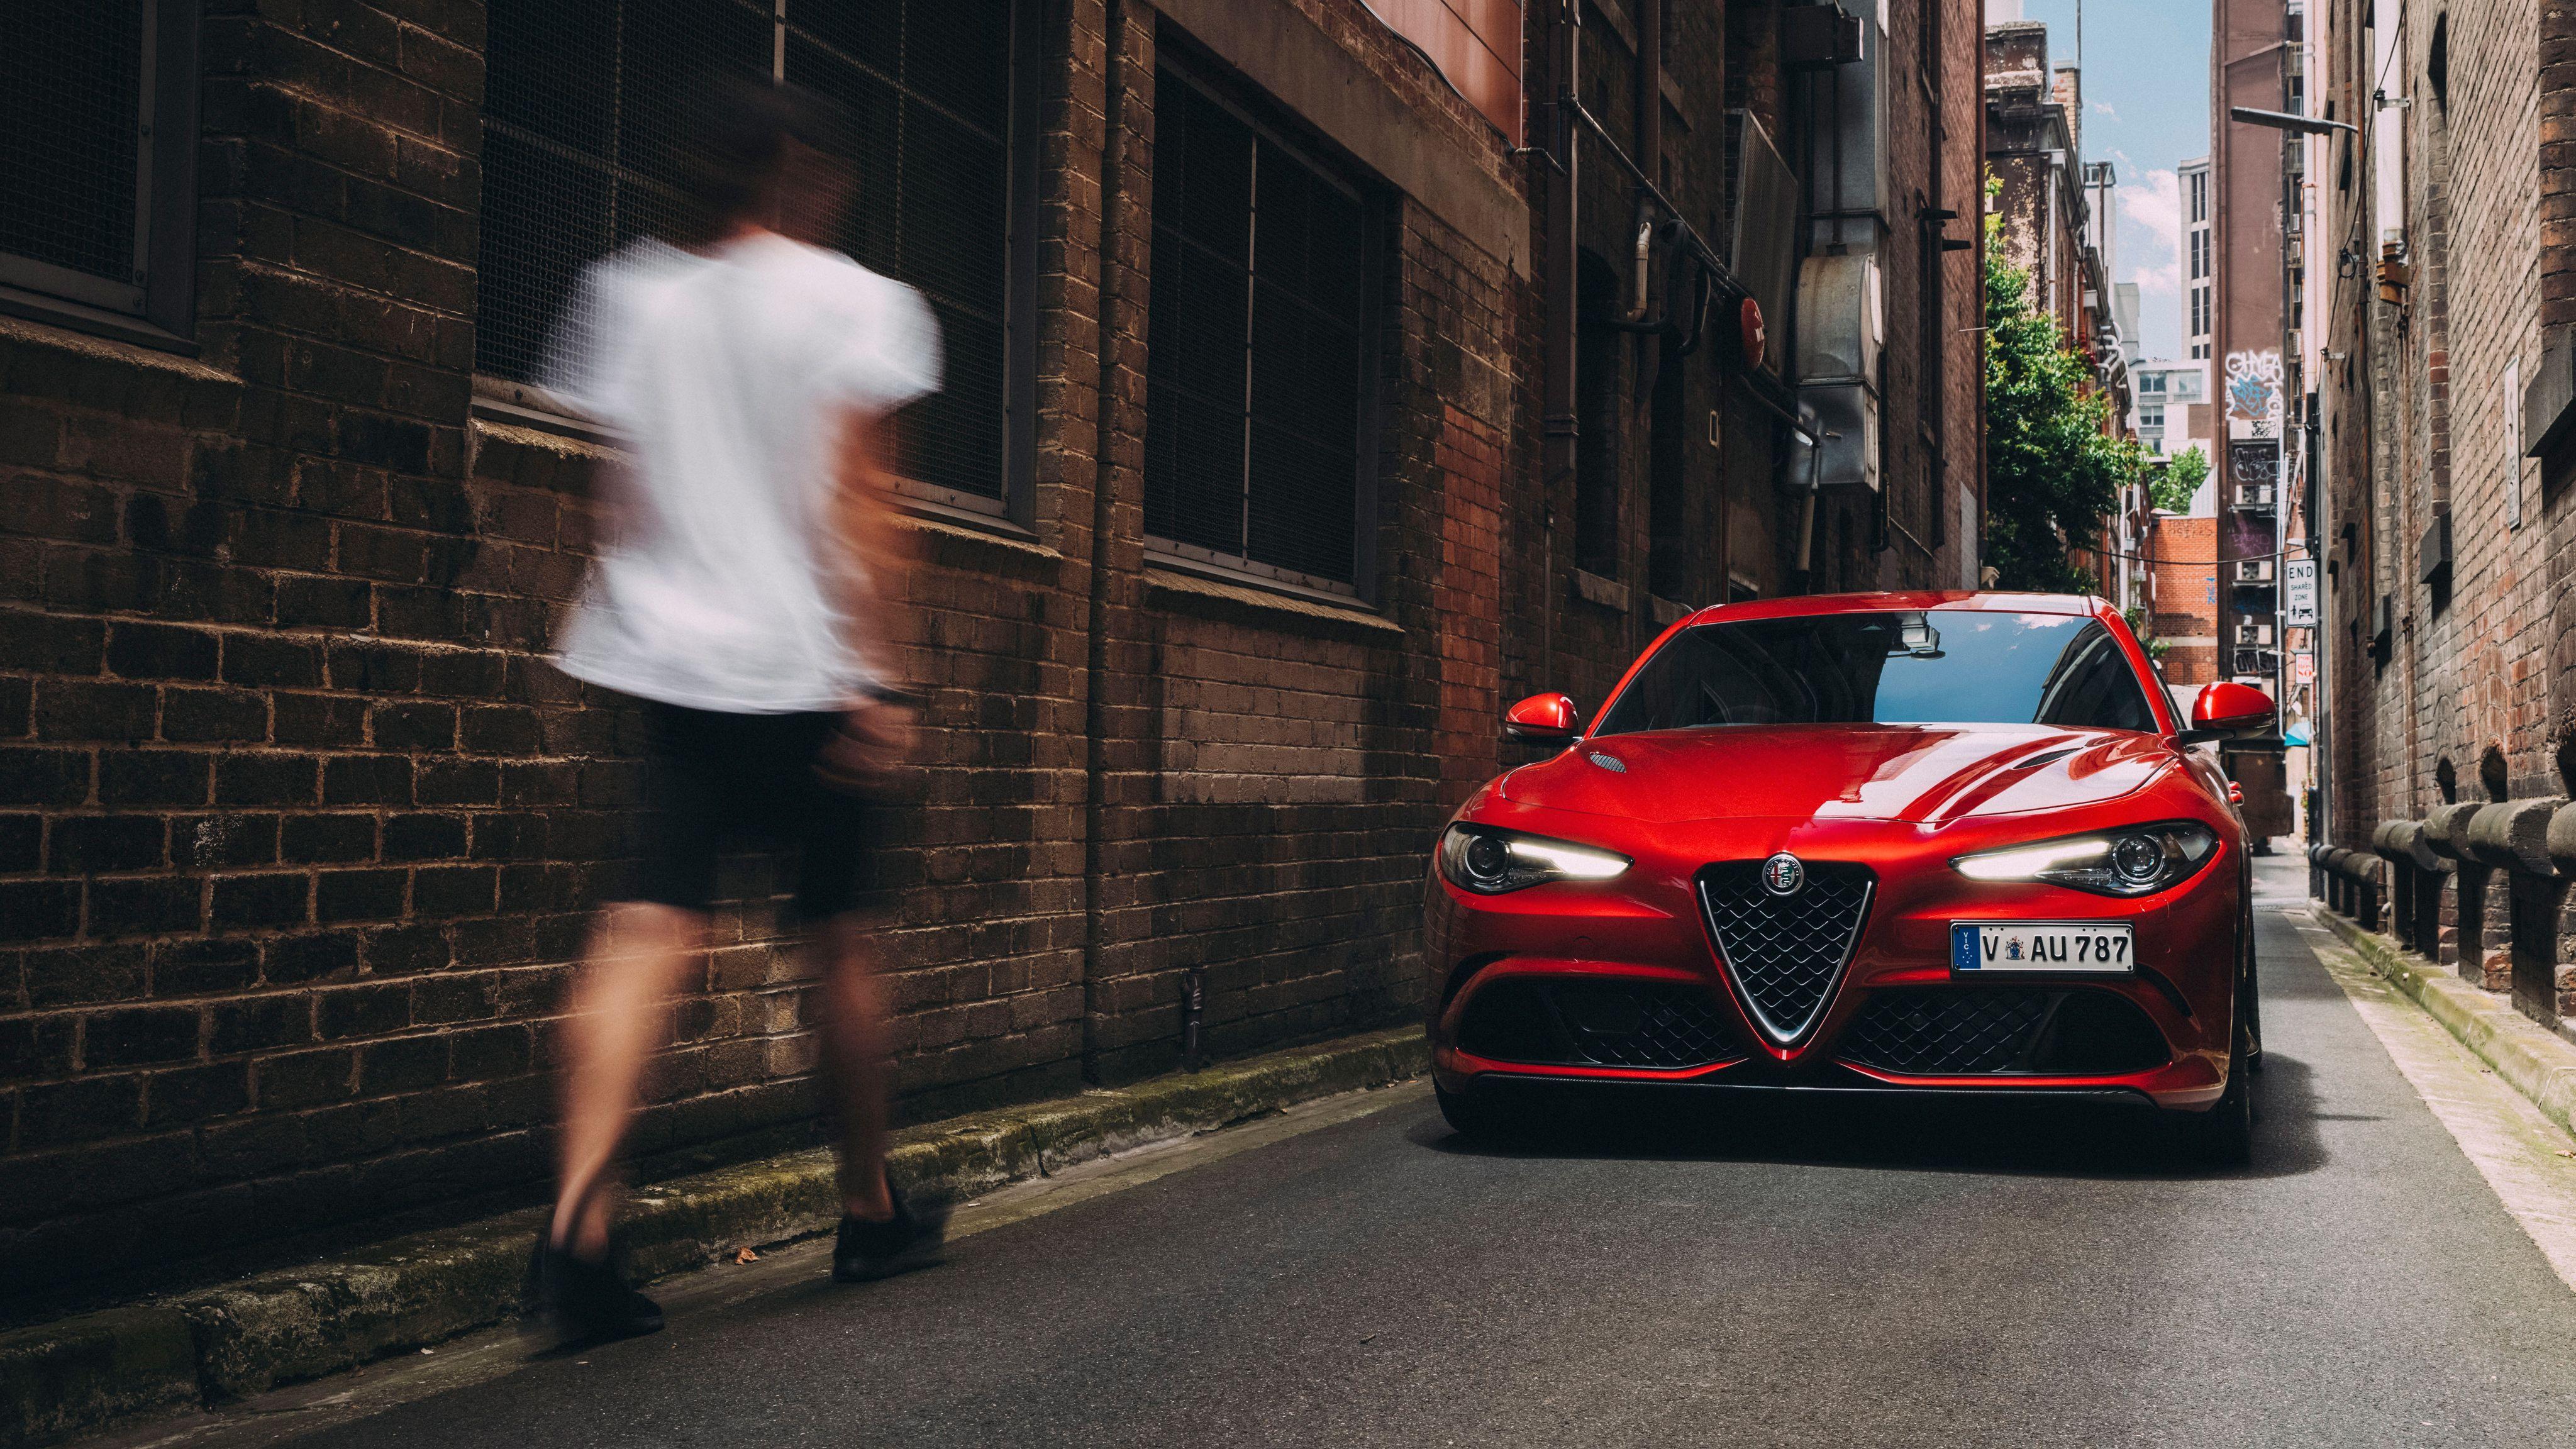 Alfa Romeo Wallpapers Top Free Alfa Romeo Backgrounds